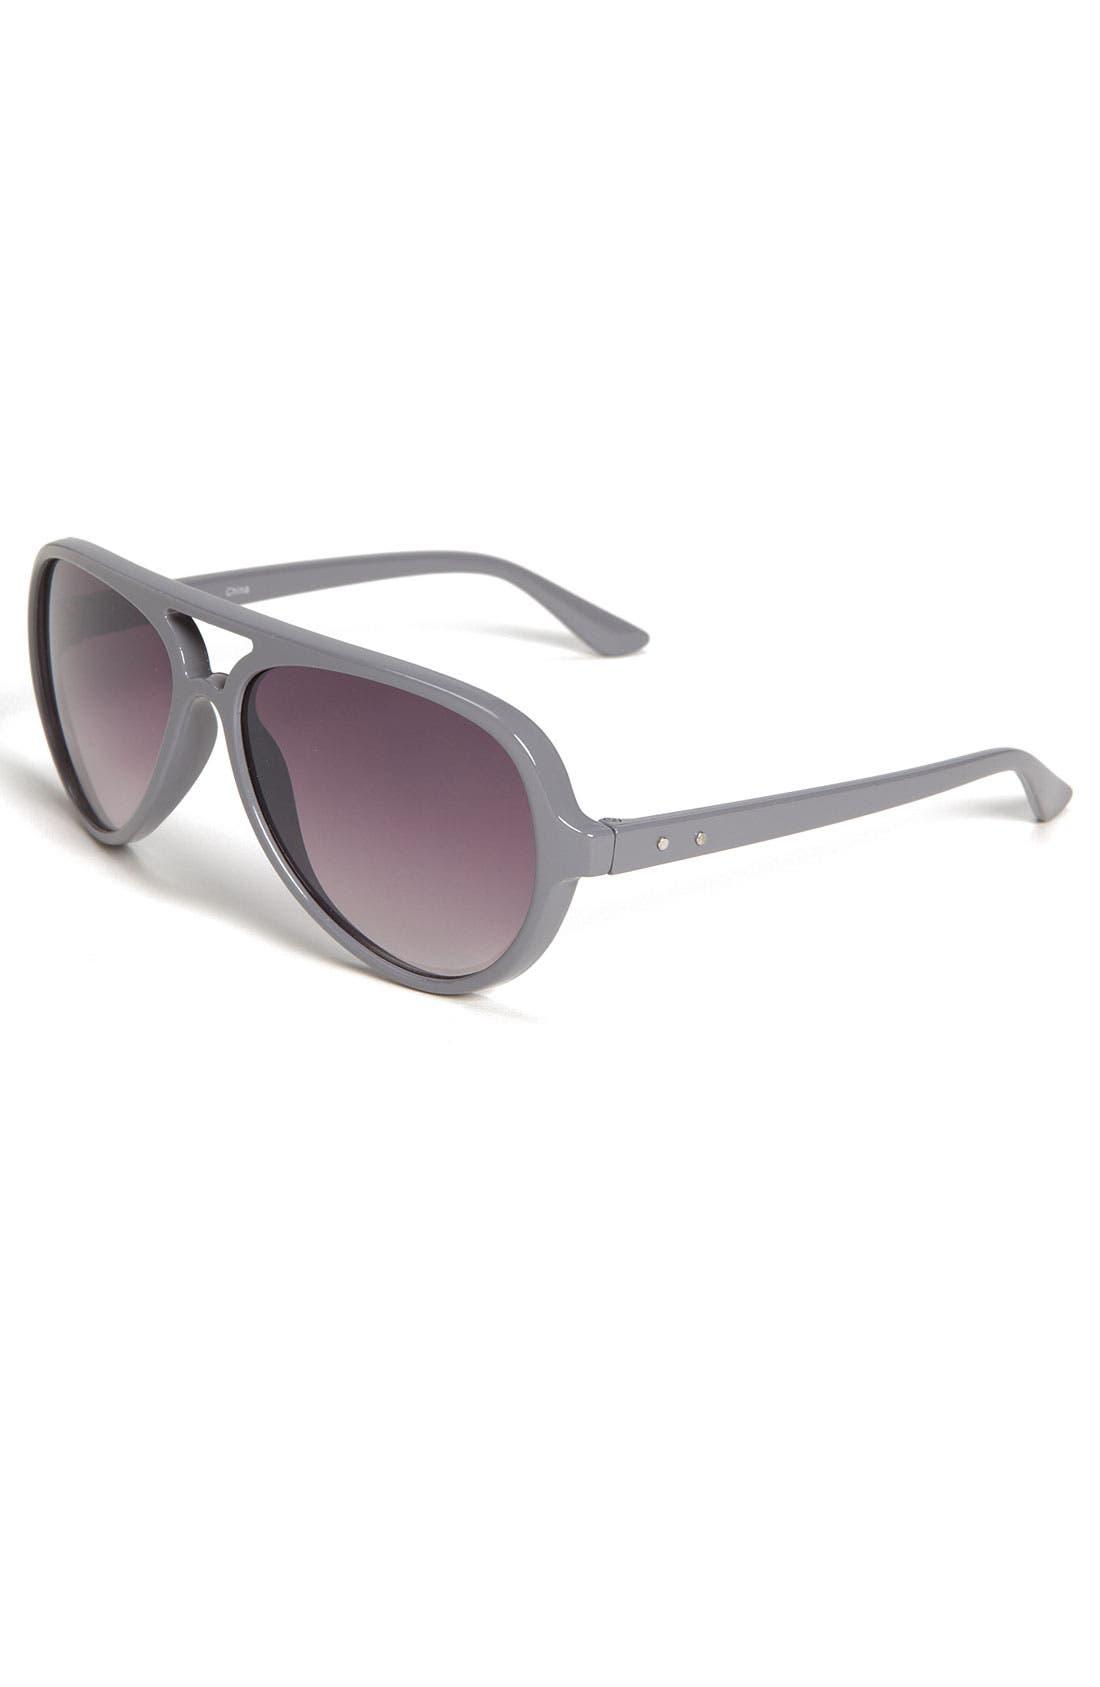 Alternate Image 1 Selected - Icon Eyewear 'Nick' Aviator Sunglasses (Big Boys)